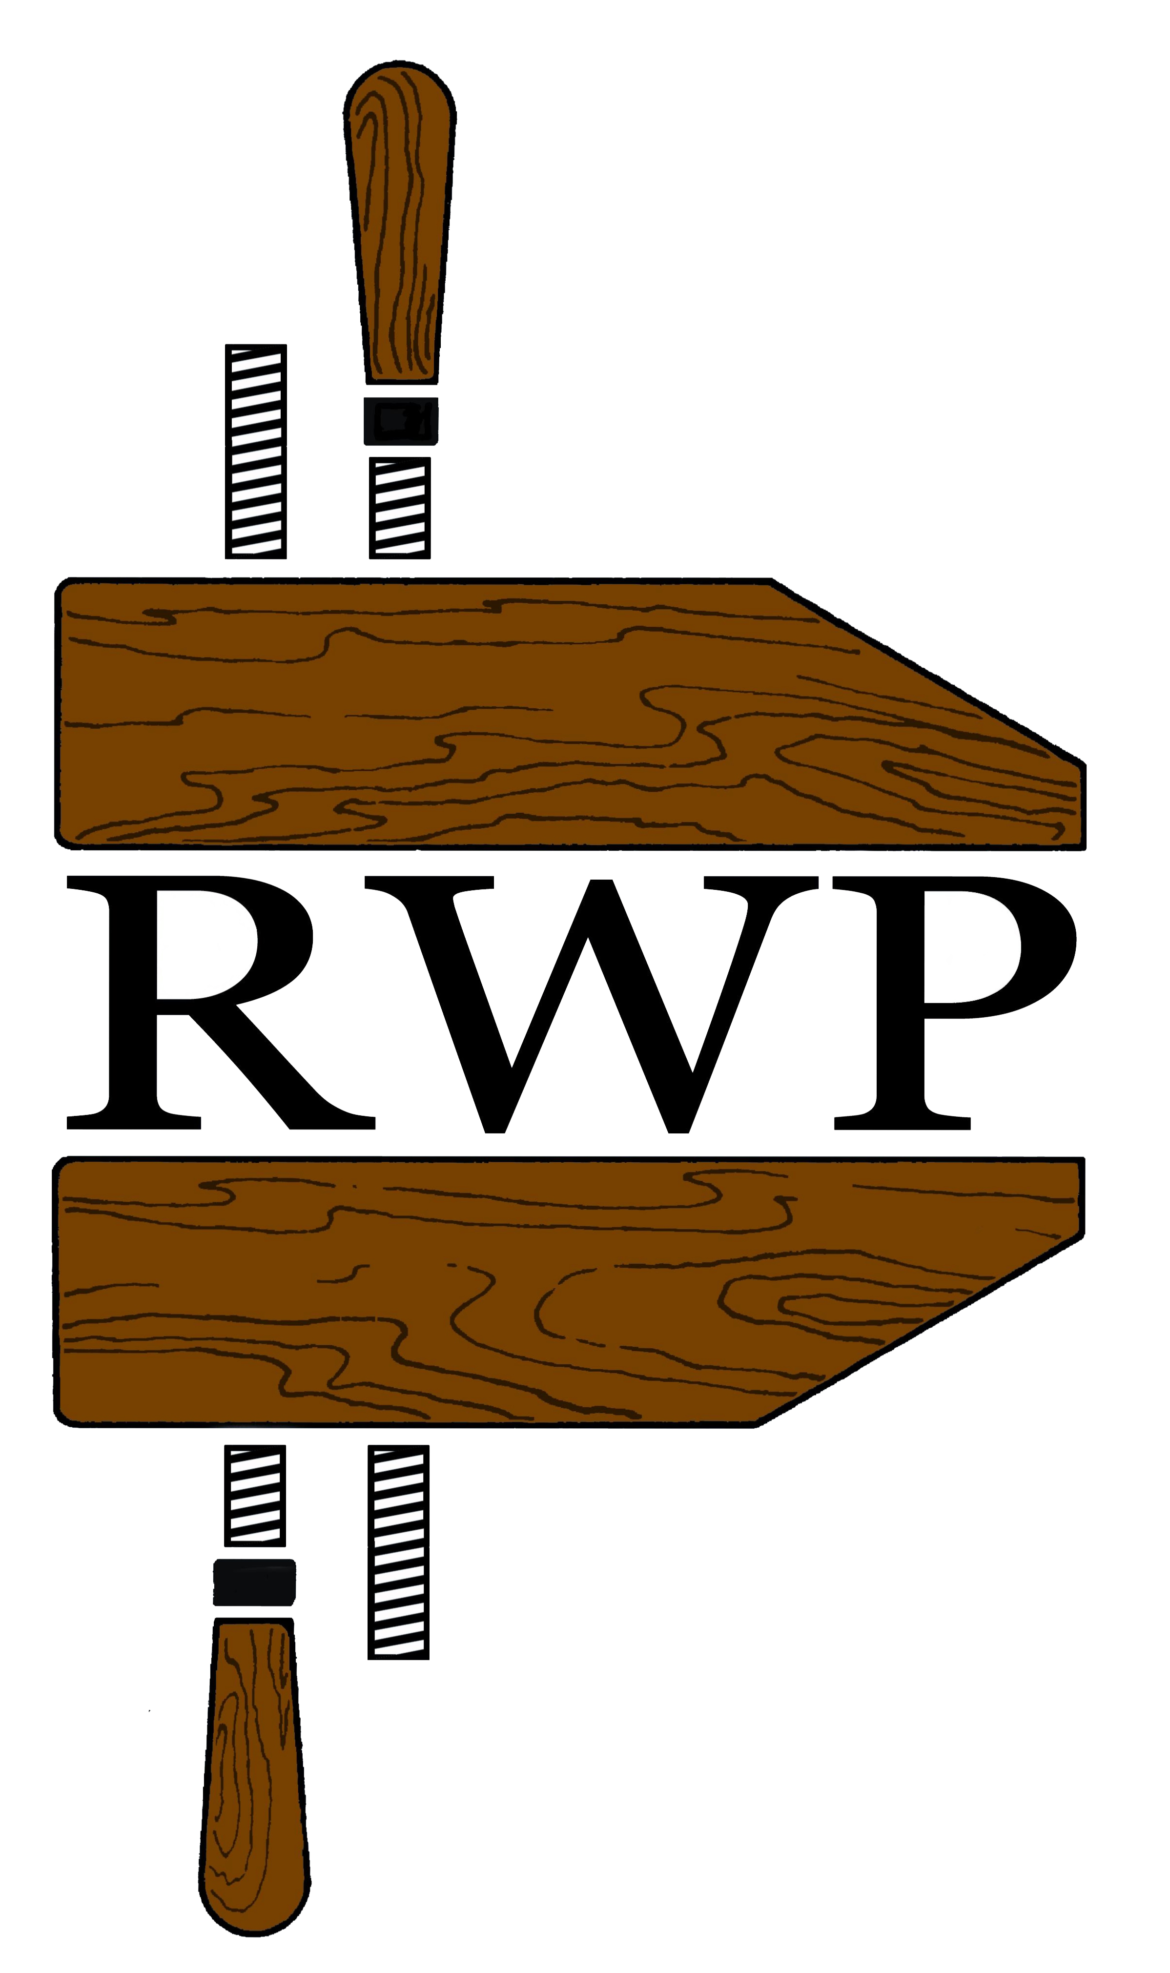 RWP-Catalog-003-Original-transparent-1.png